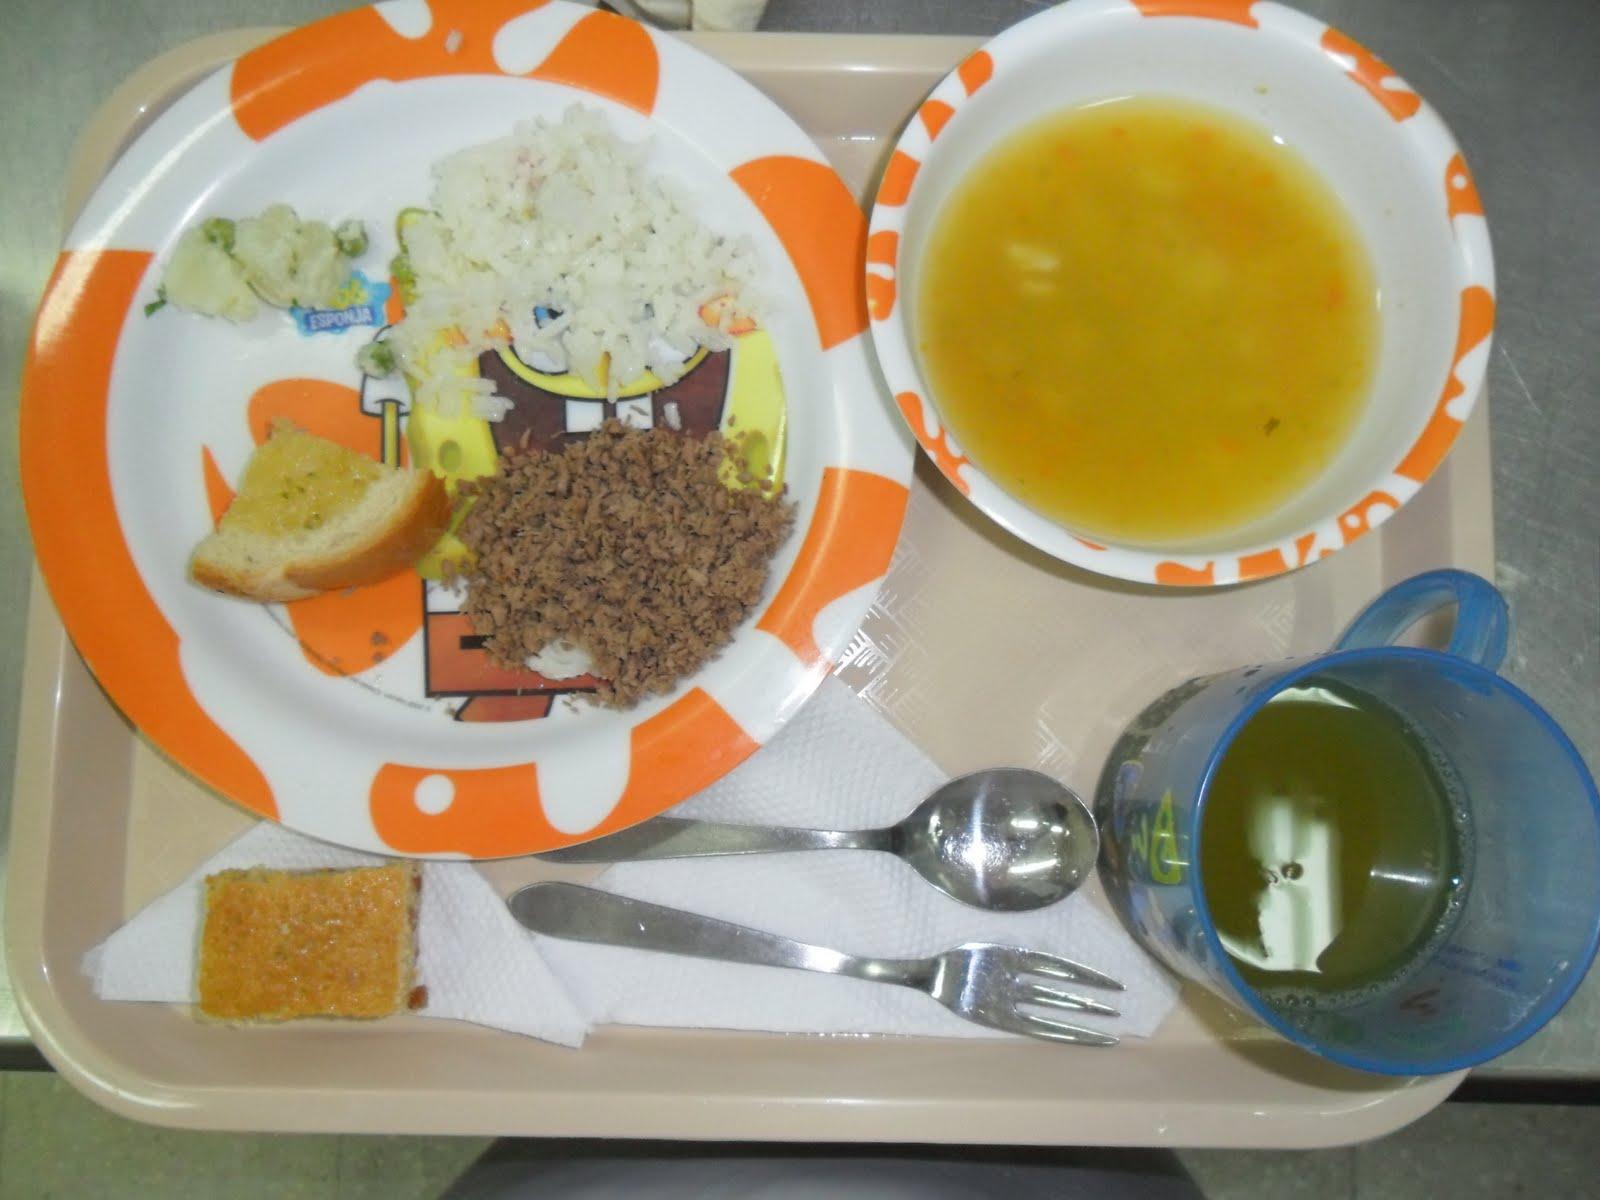 Cres ma anitas minutas martes 22 feb almuerzo for Almuerzo en frances